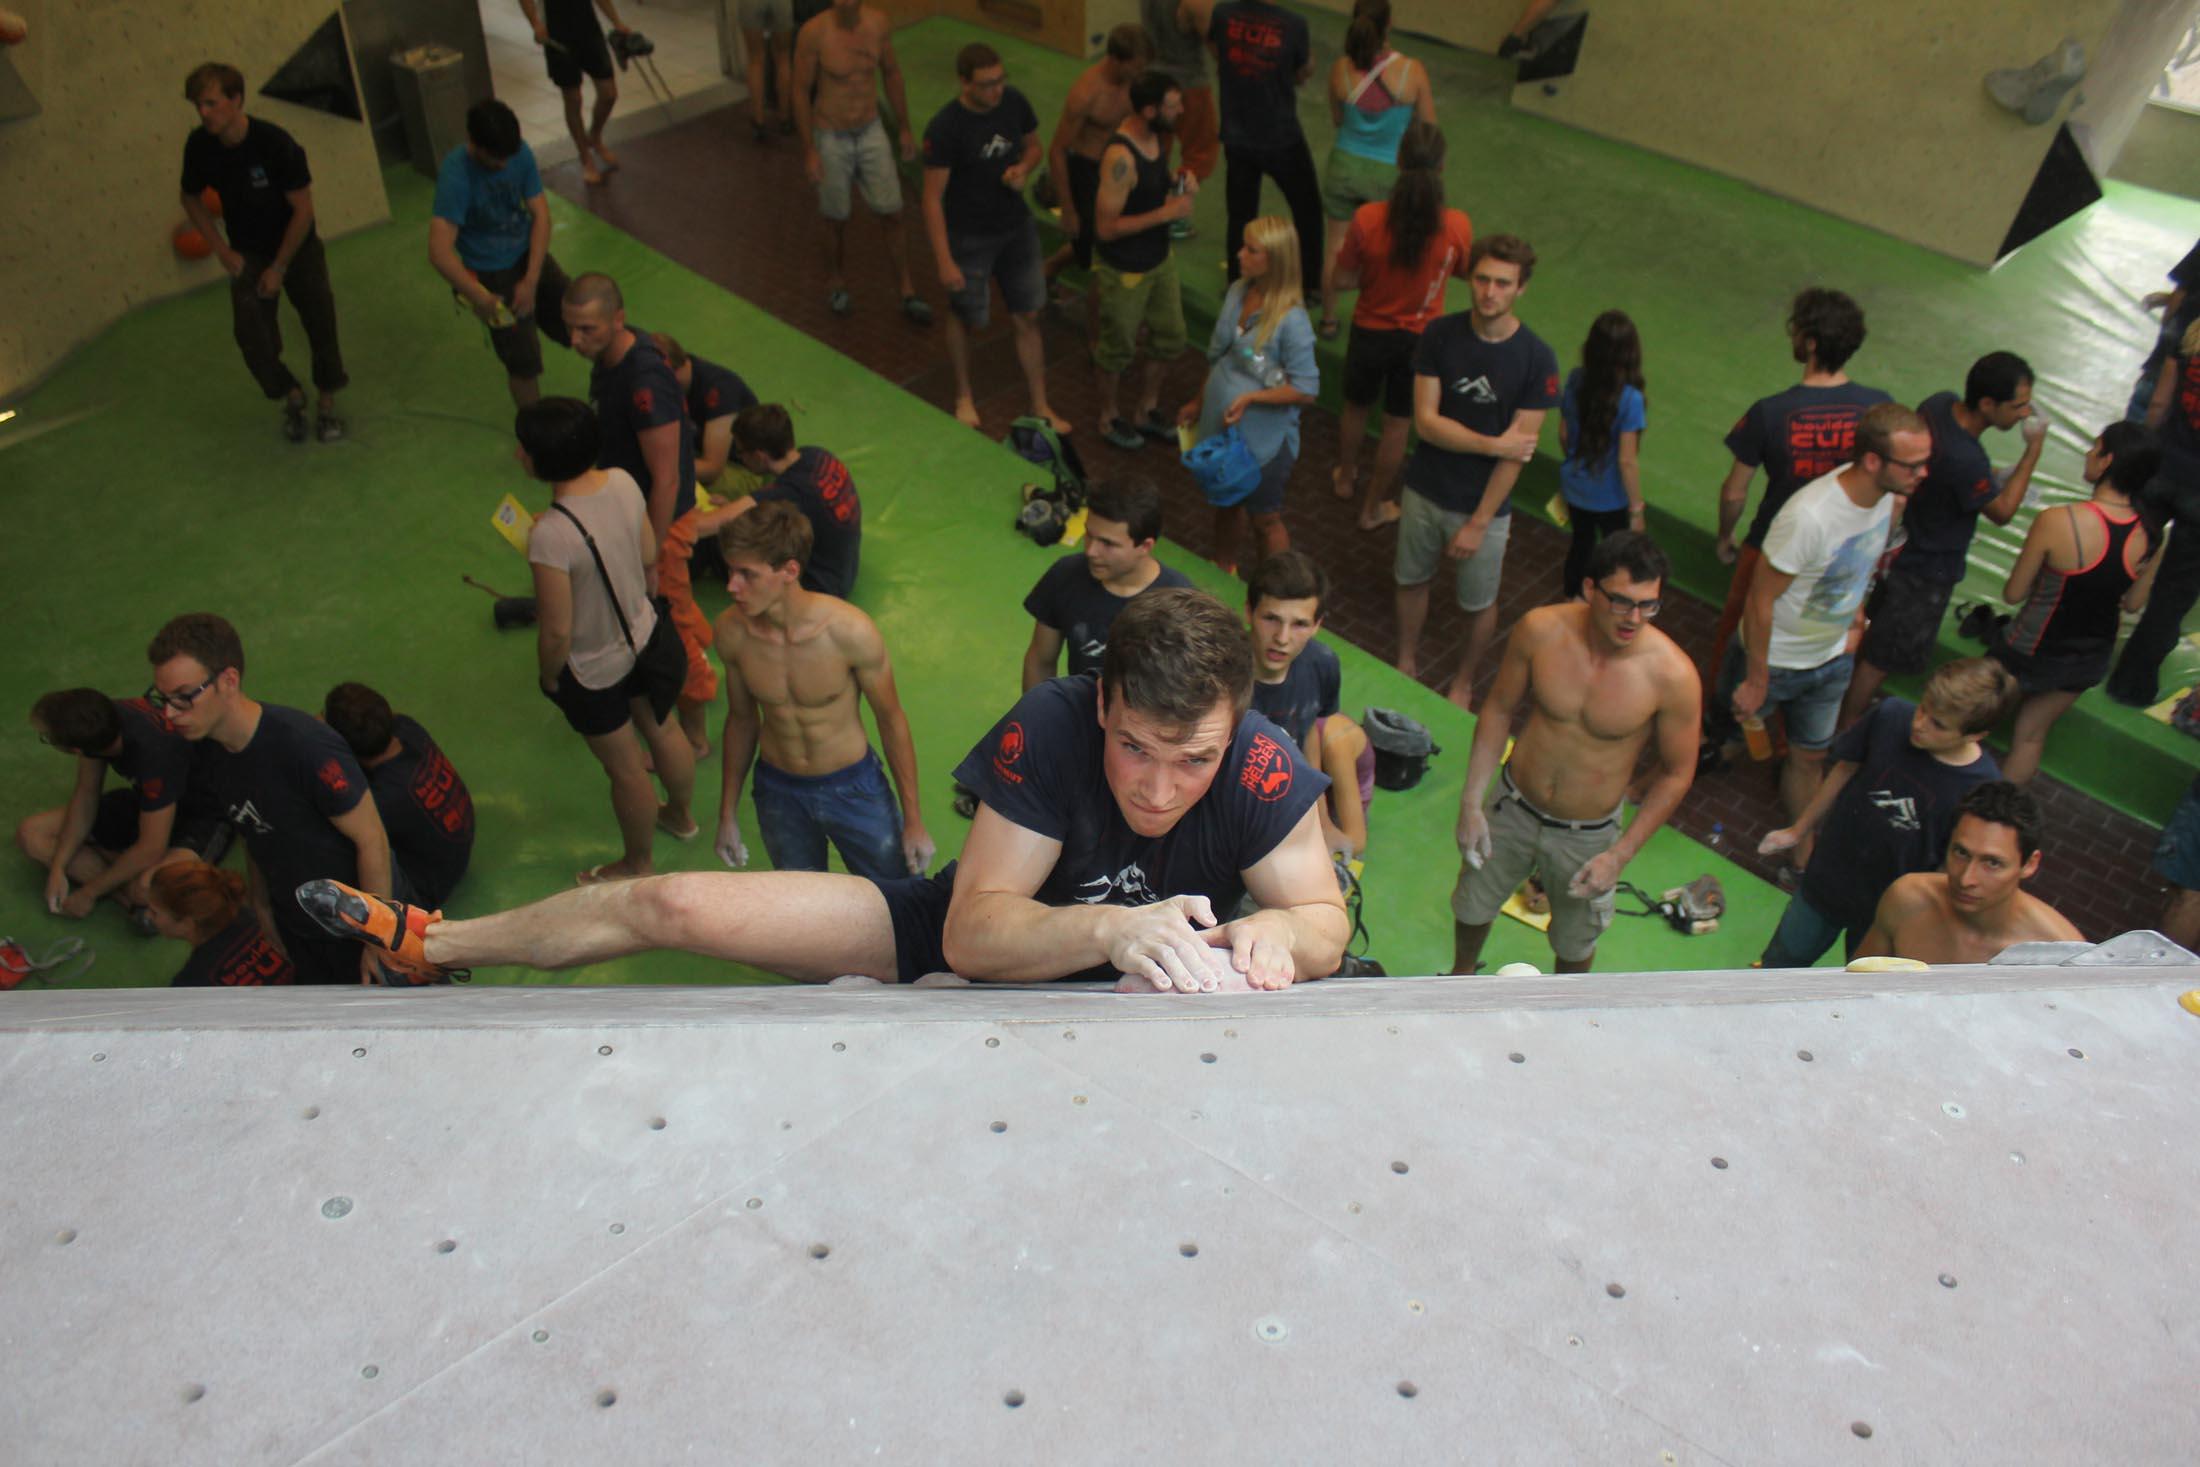 Quali, internationaler bouldercup Frankenjura 2016, BLOCKHELDEN Erlangen, Mammut, Bergfreunde.de, Boulderwettkampf07092016291